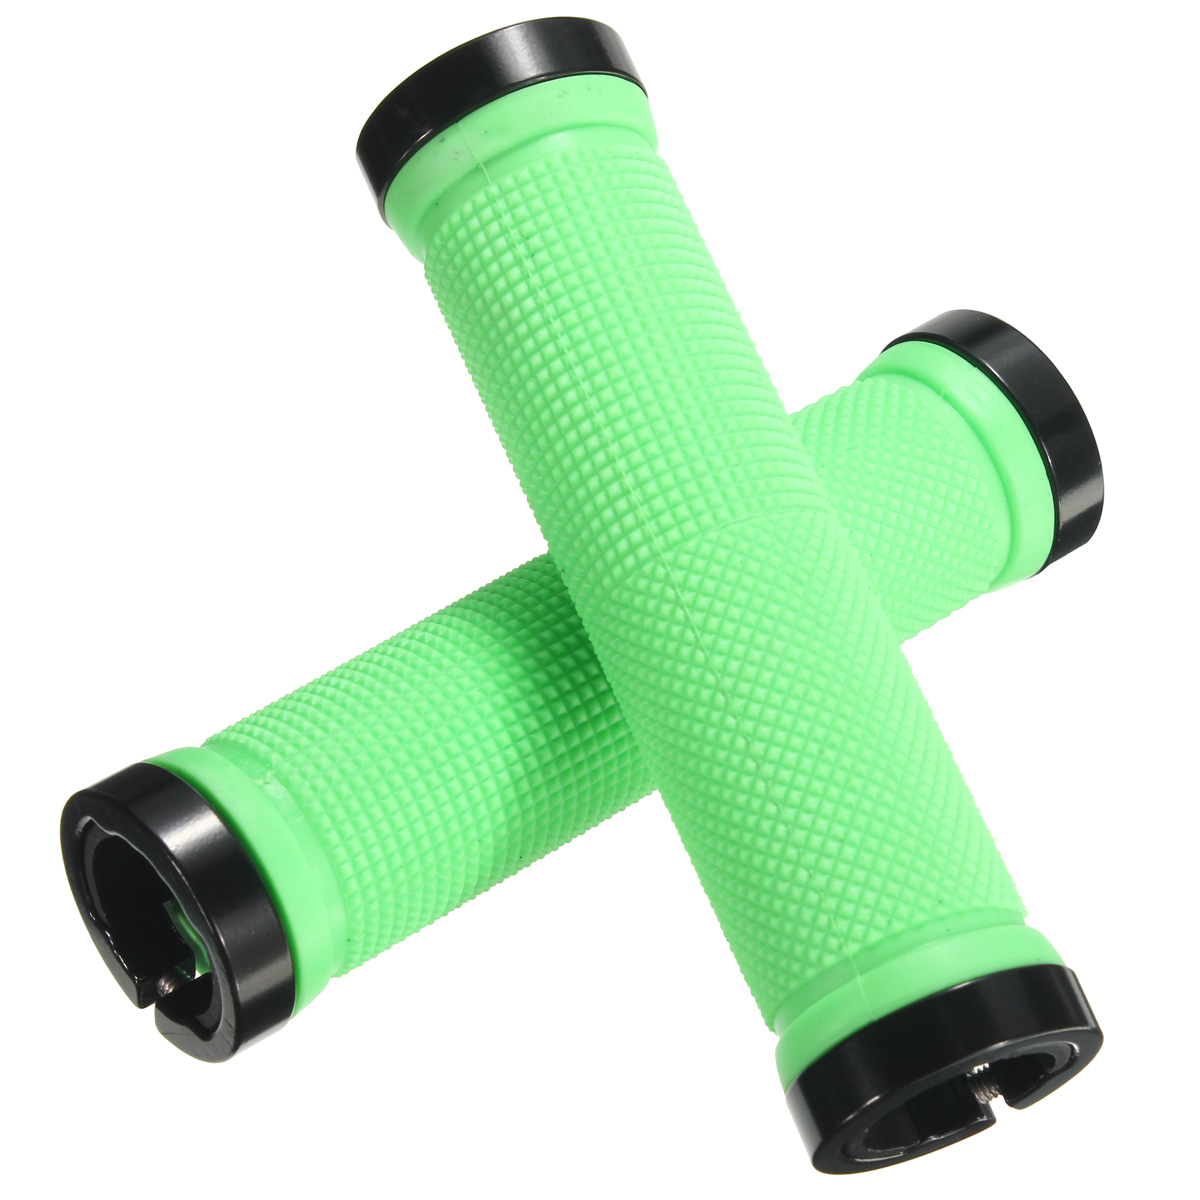 Rubber + Aluminnum Alloy Lock-on Nonslip Bike Bicycle MTB Cycling Handle Bar Set Grip Handlebar Grips &amp 10 Colors